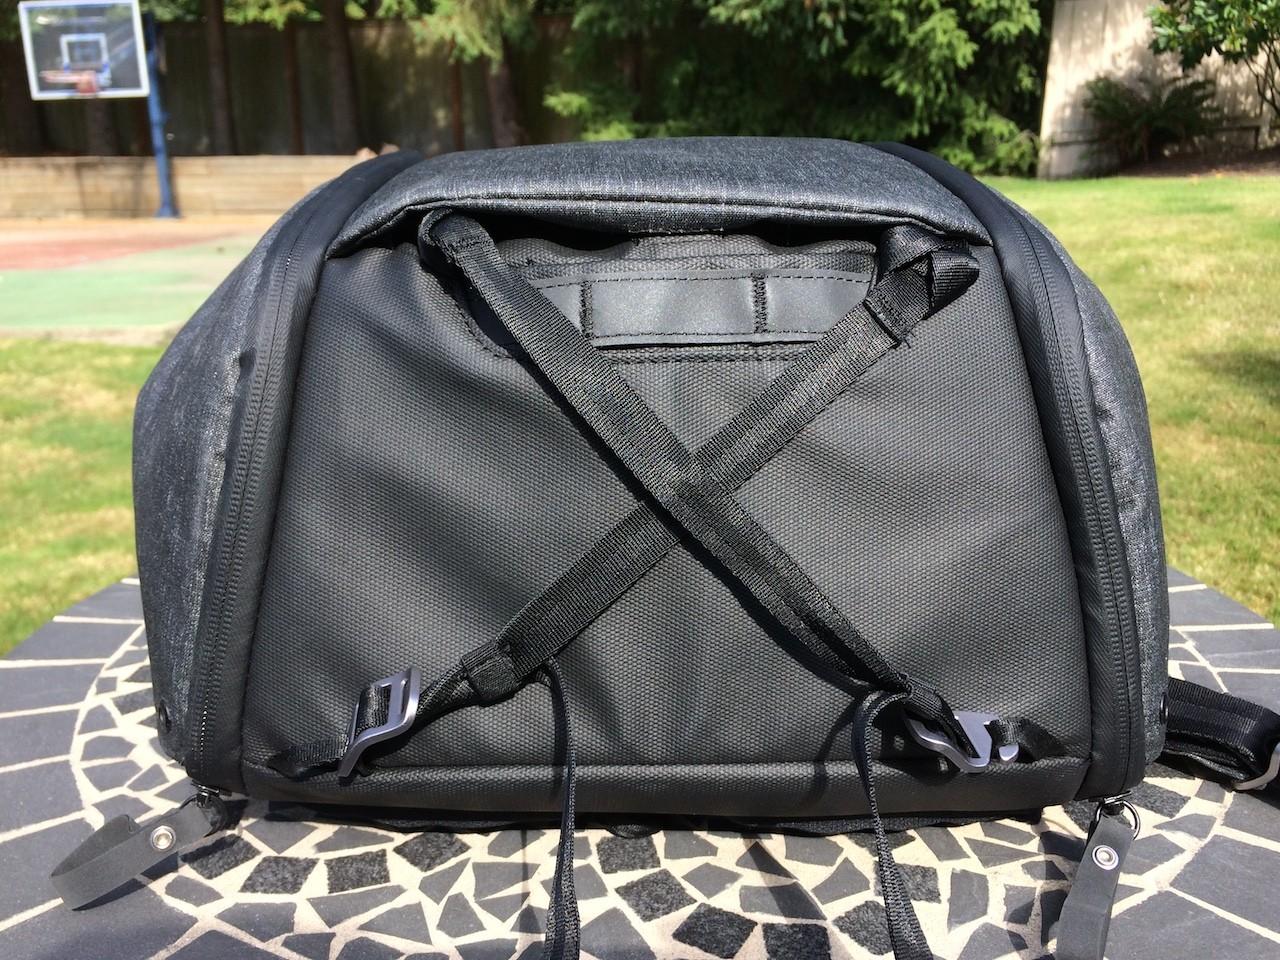 Peak Design Everyday Backpack straps on bottom